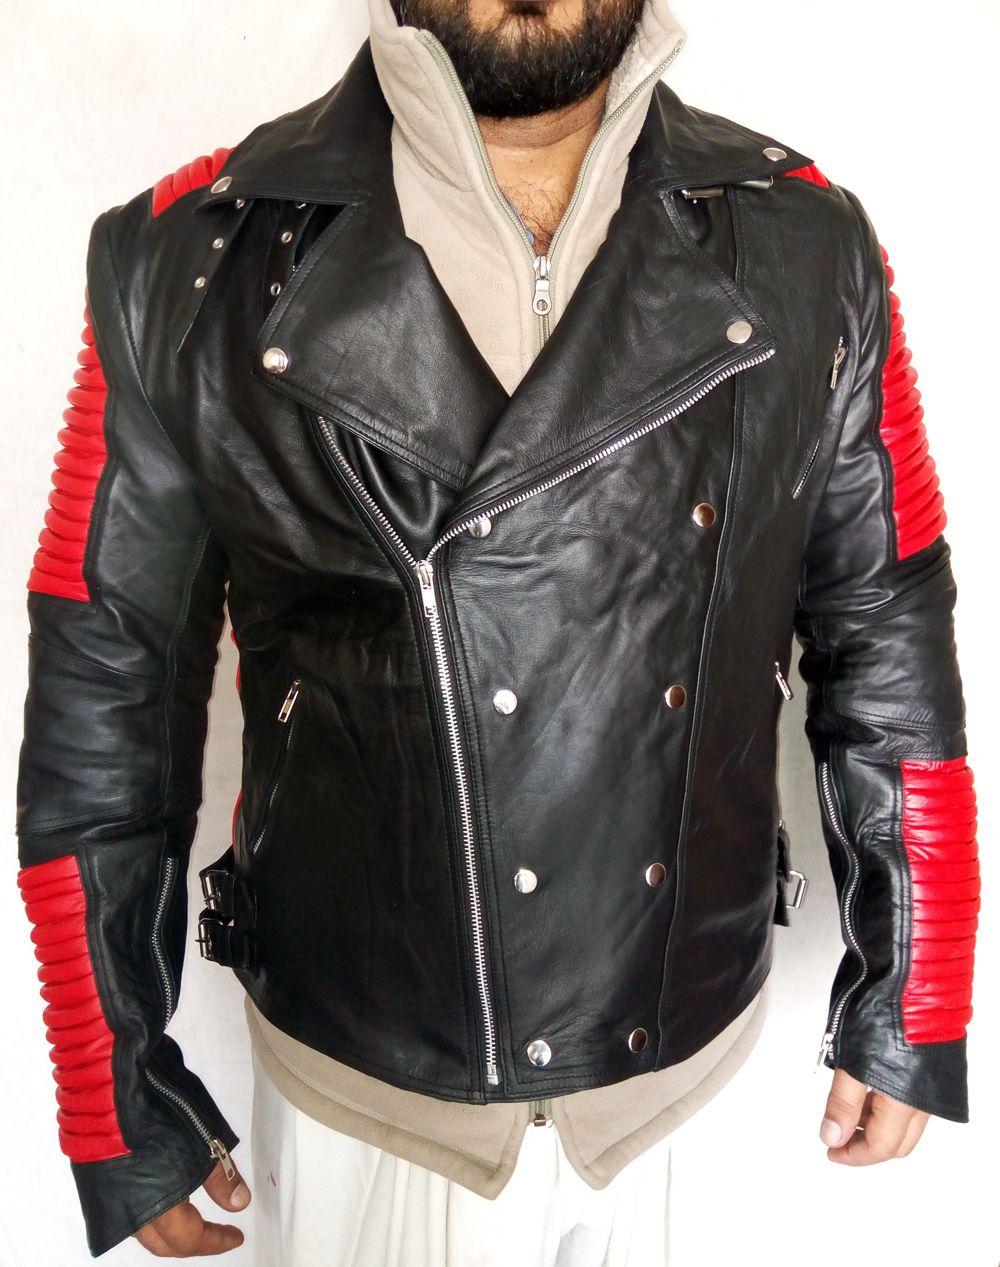 Men S Bailman Style Red Black Red Ribbed Fashion Leather Jacket Men S Leather Jacket Leather Coat Jacket [ 1267 x 1000 Pixel ]